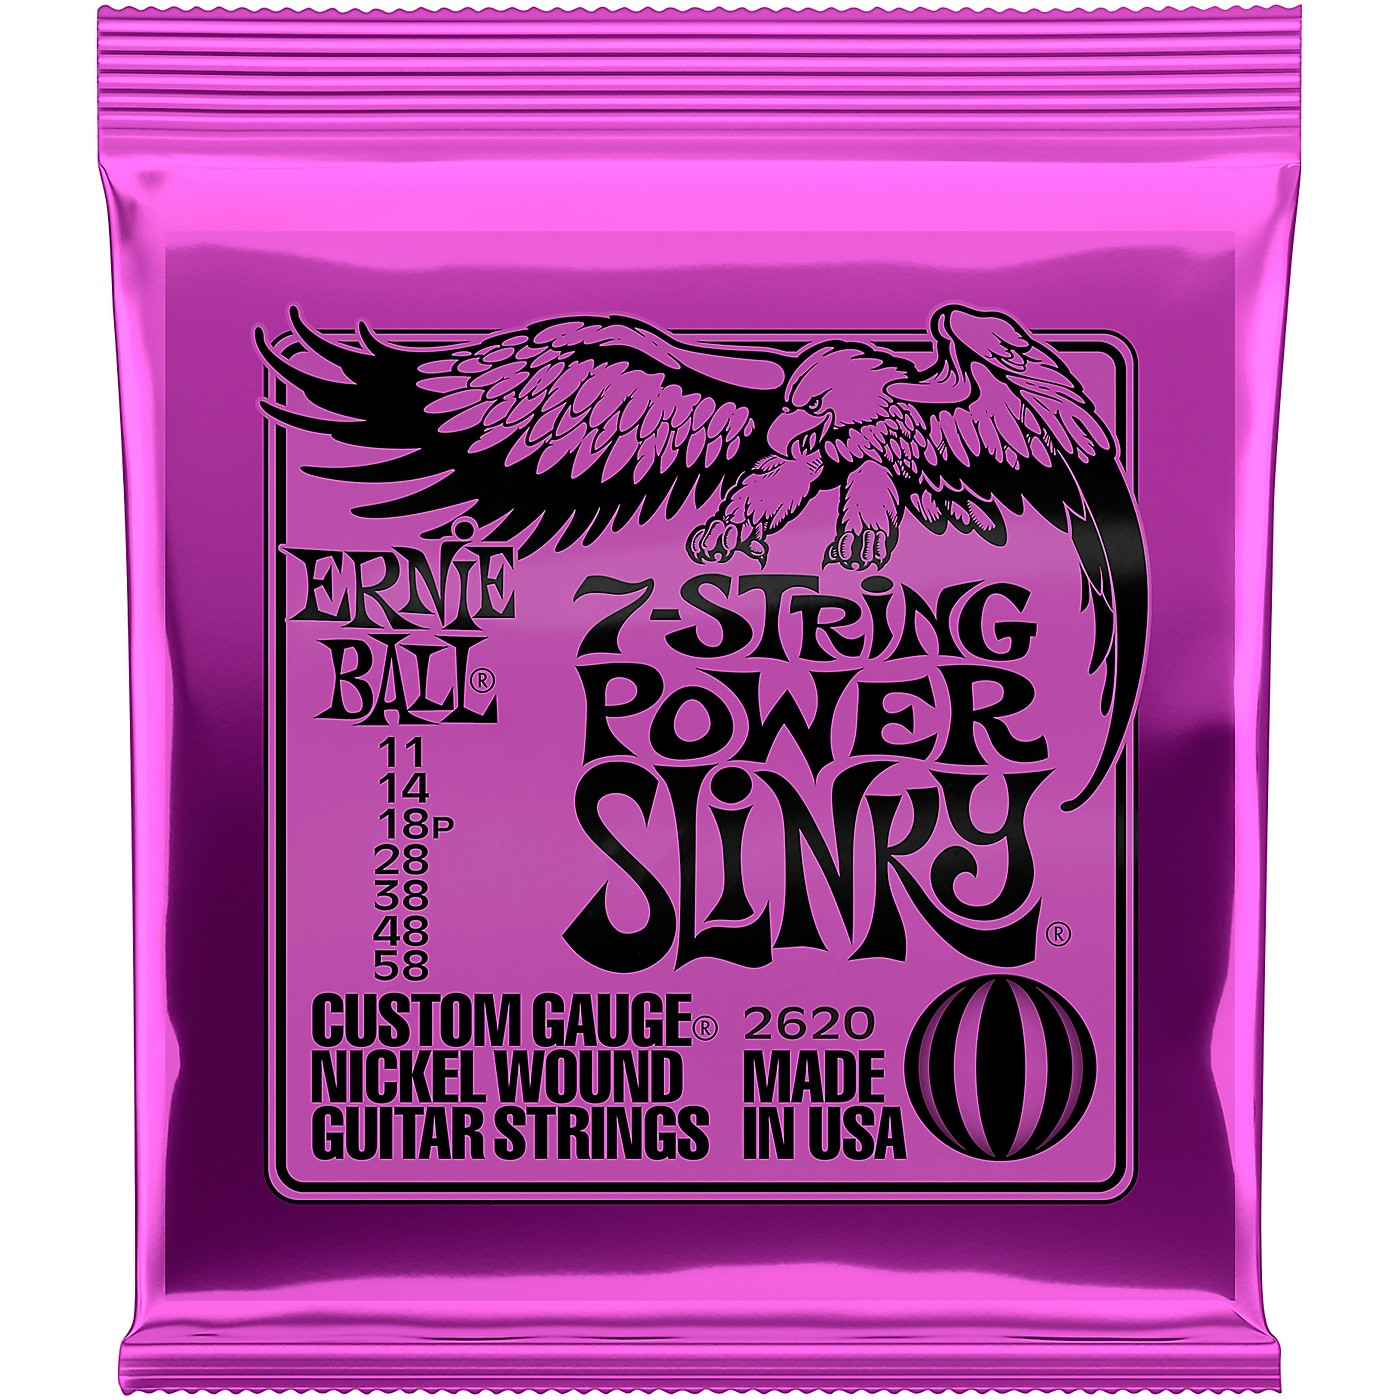 Ernie Ball 2620 Nickel 7-String Power Slinky Electric Guitar Strings thumbnail